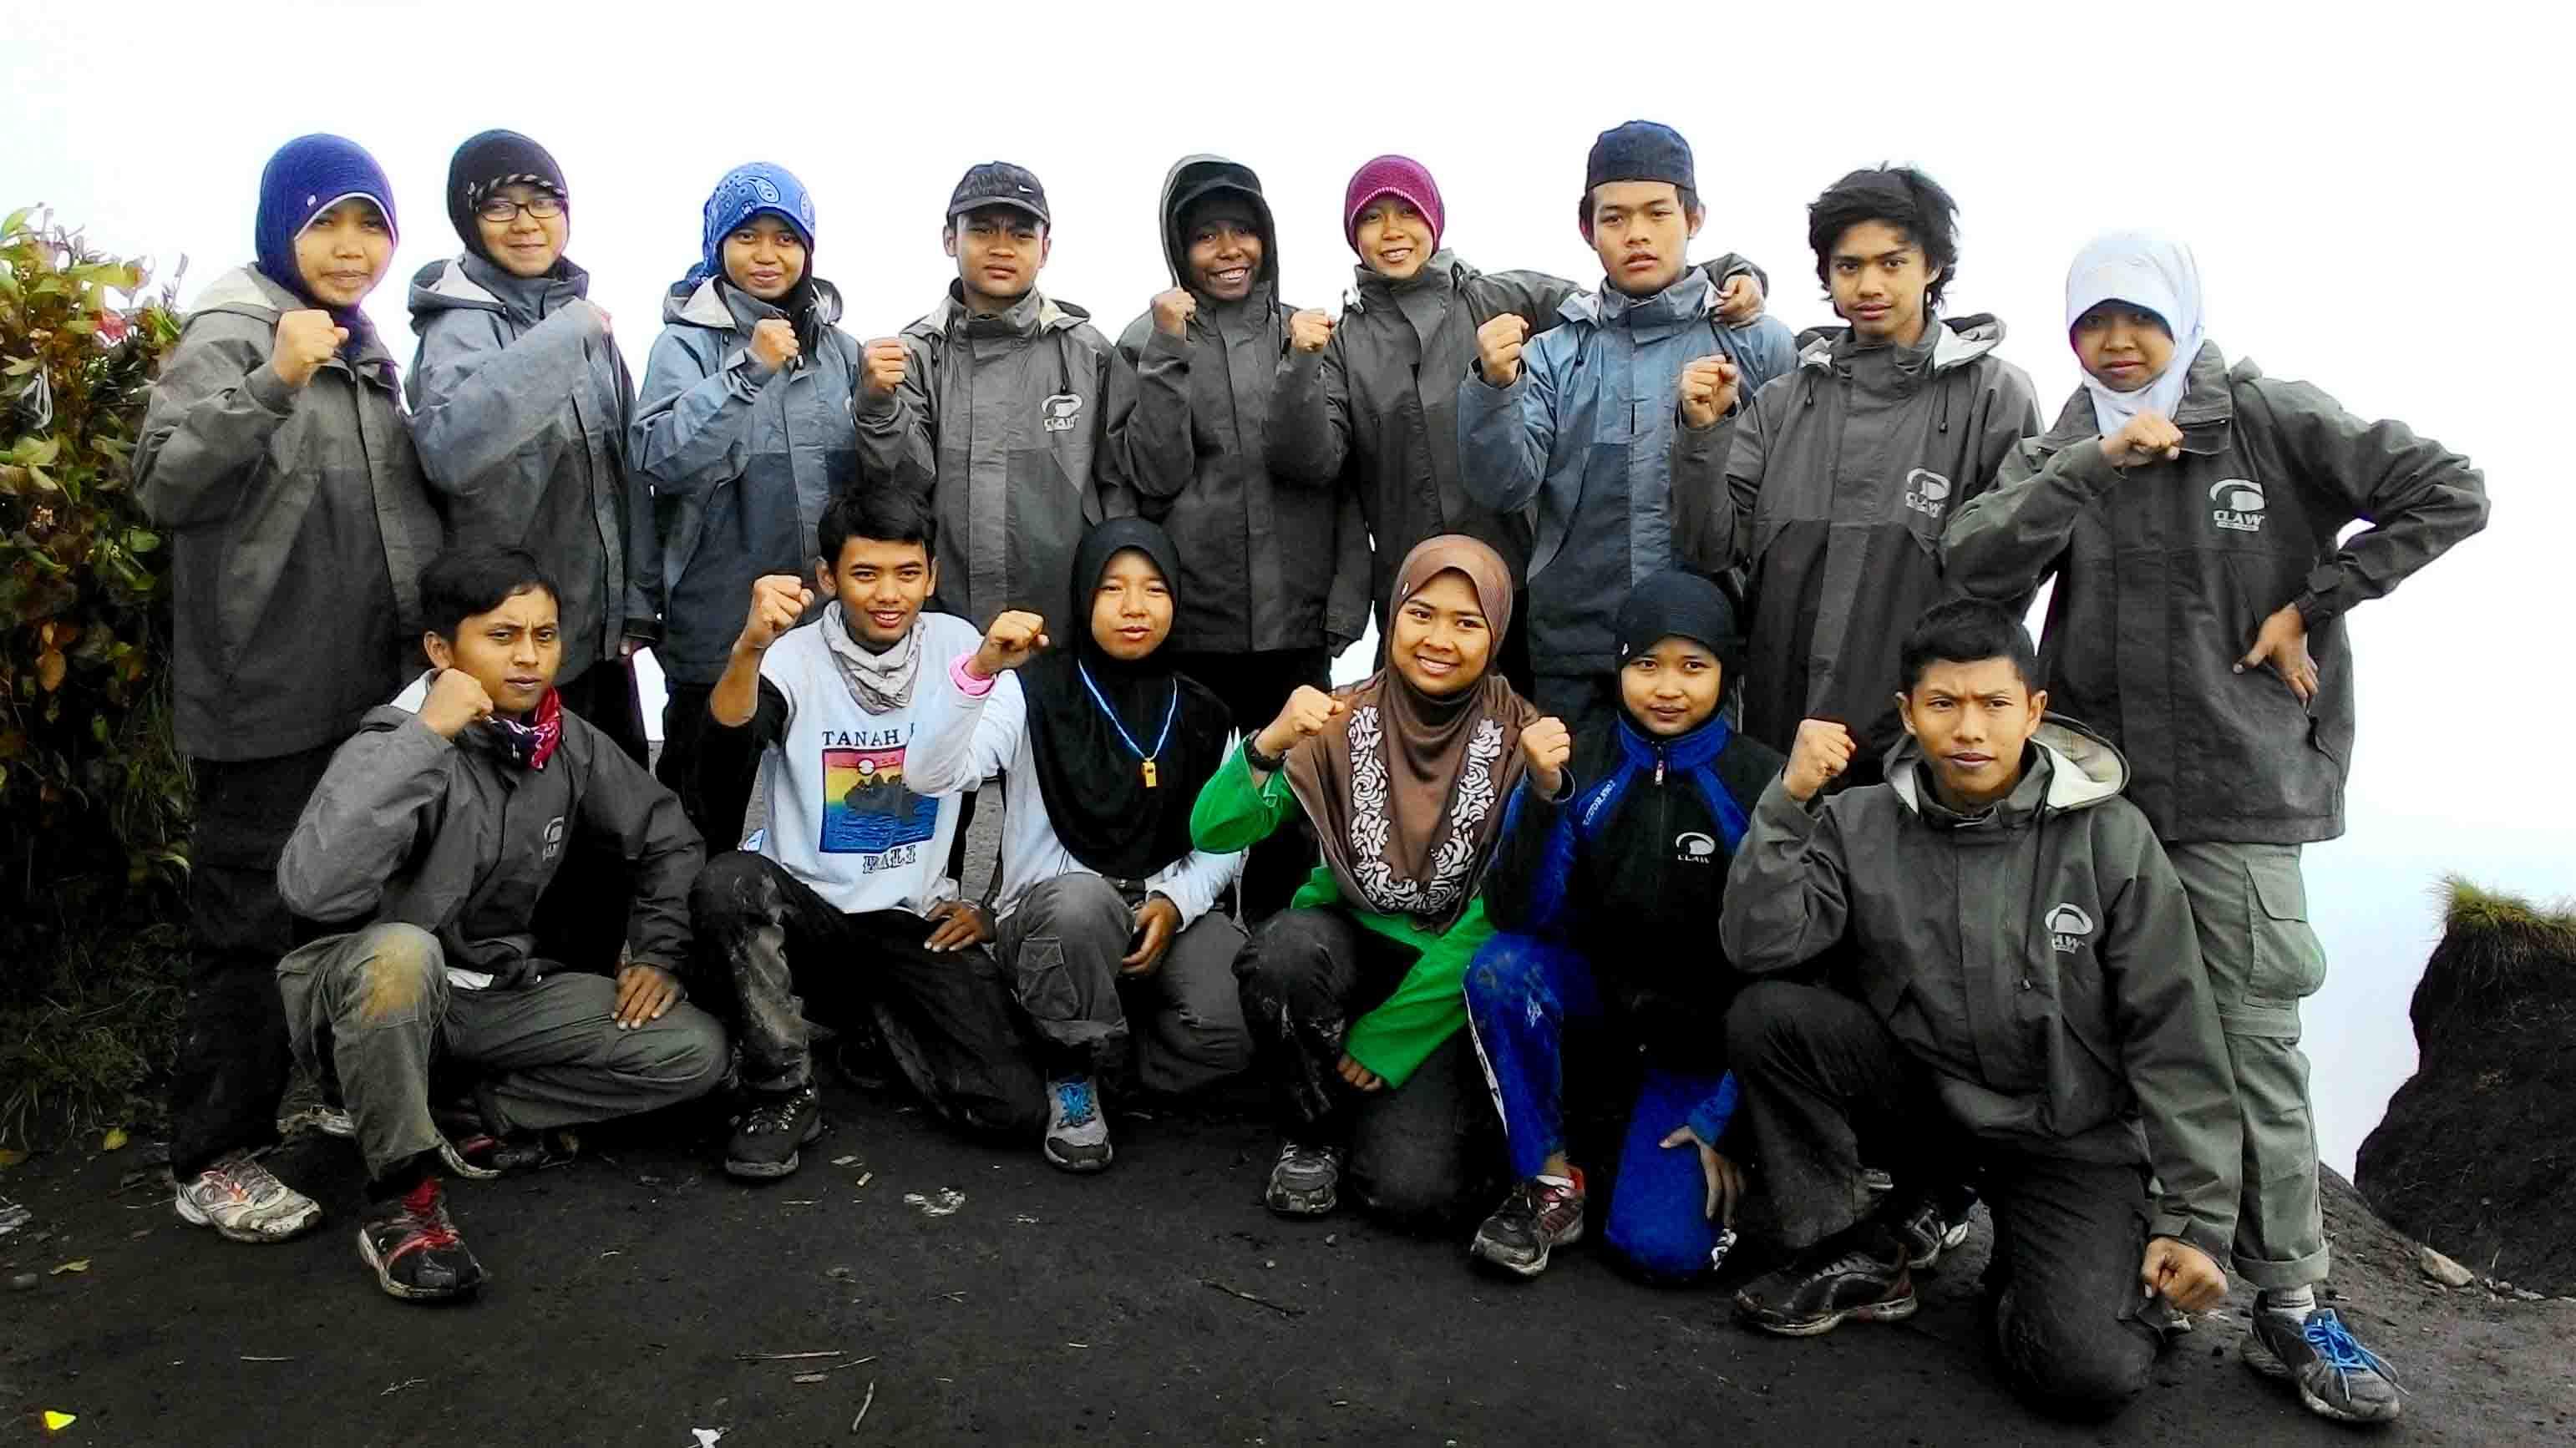 Ekspedisi ke Gunung Carstensz Pyramid, Mahapala Unnes Latihan di Gunung Merbabu